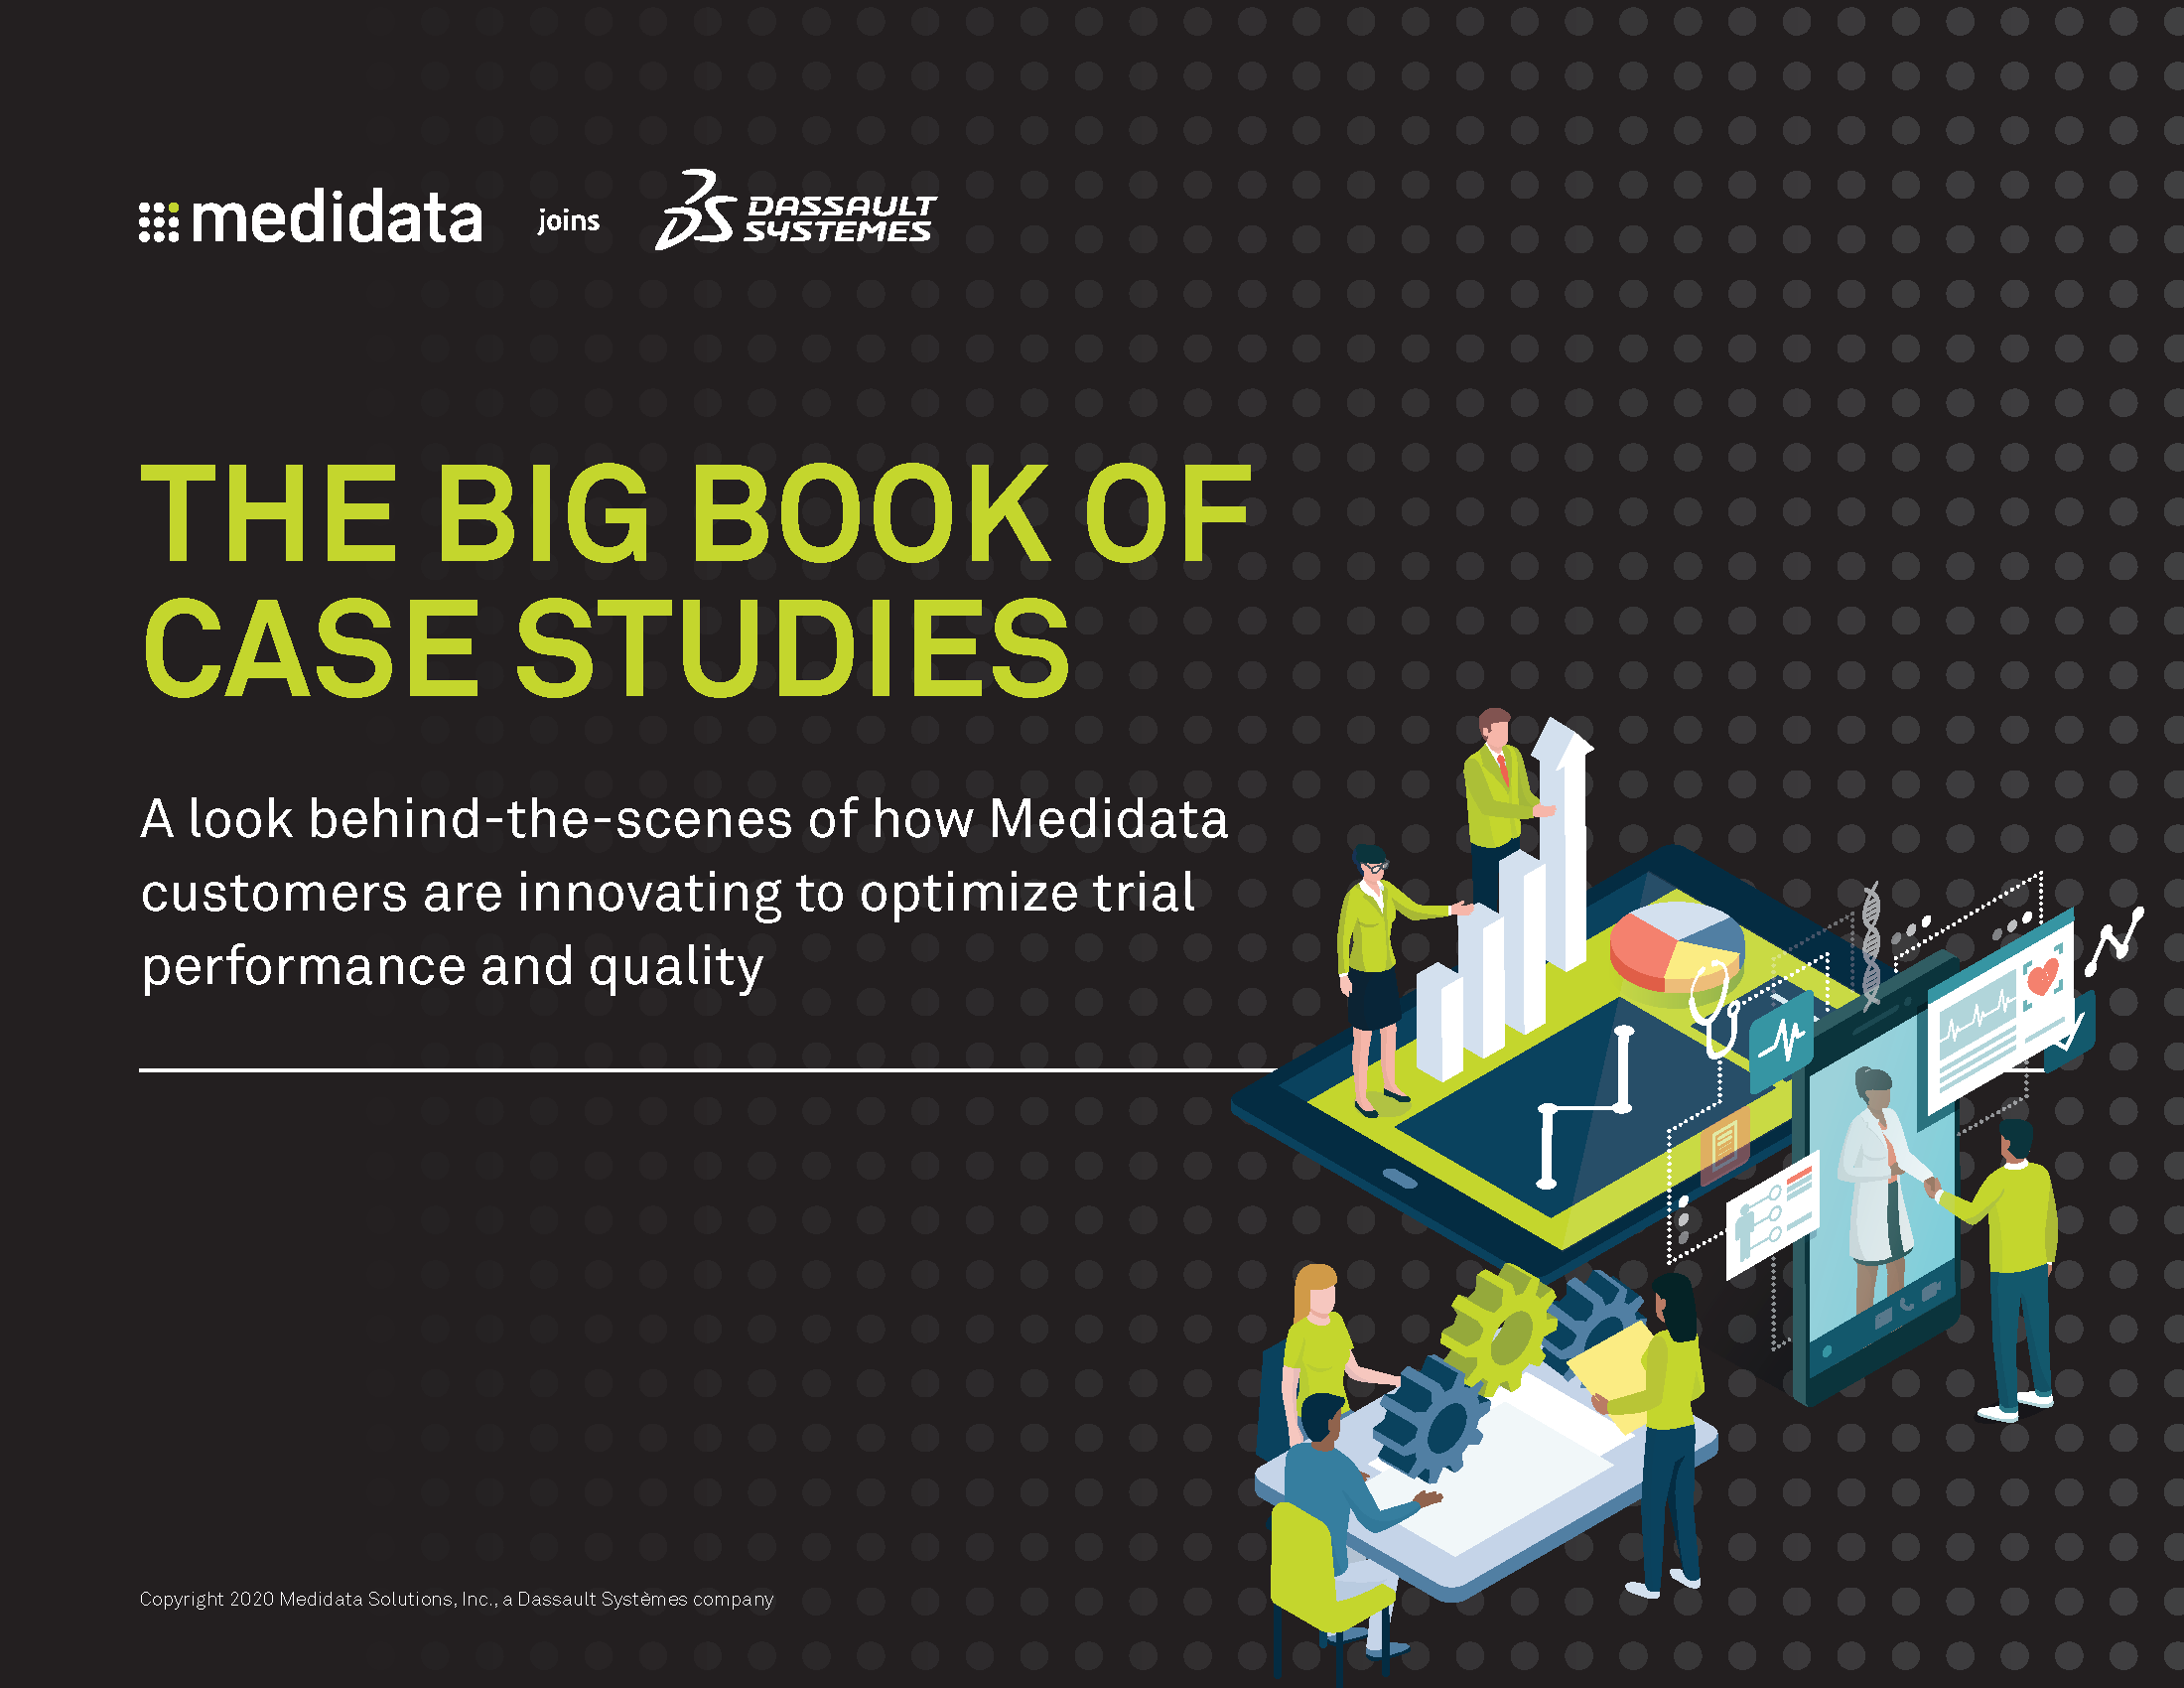 The Big Book of Case Studies